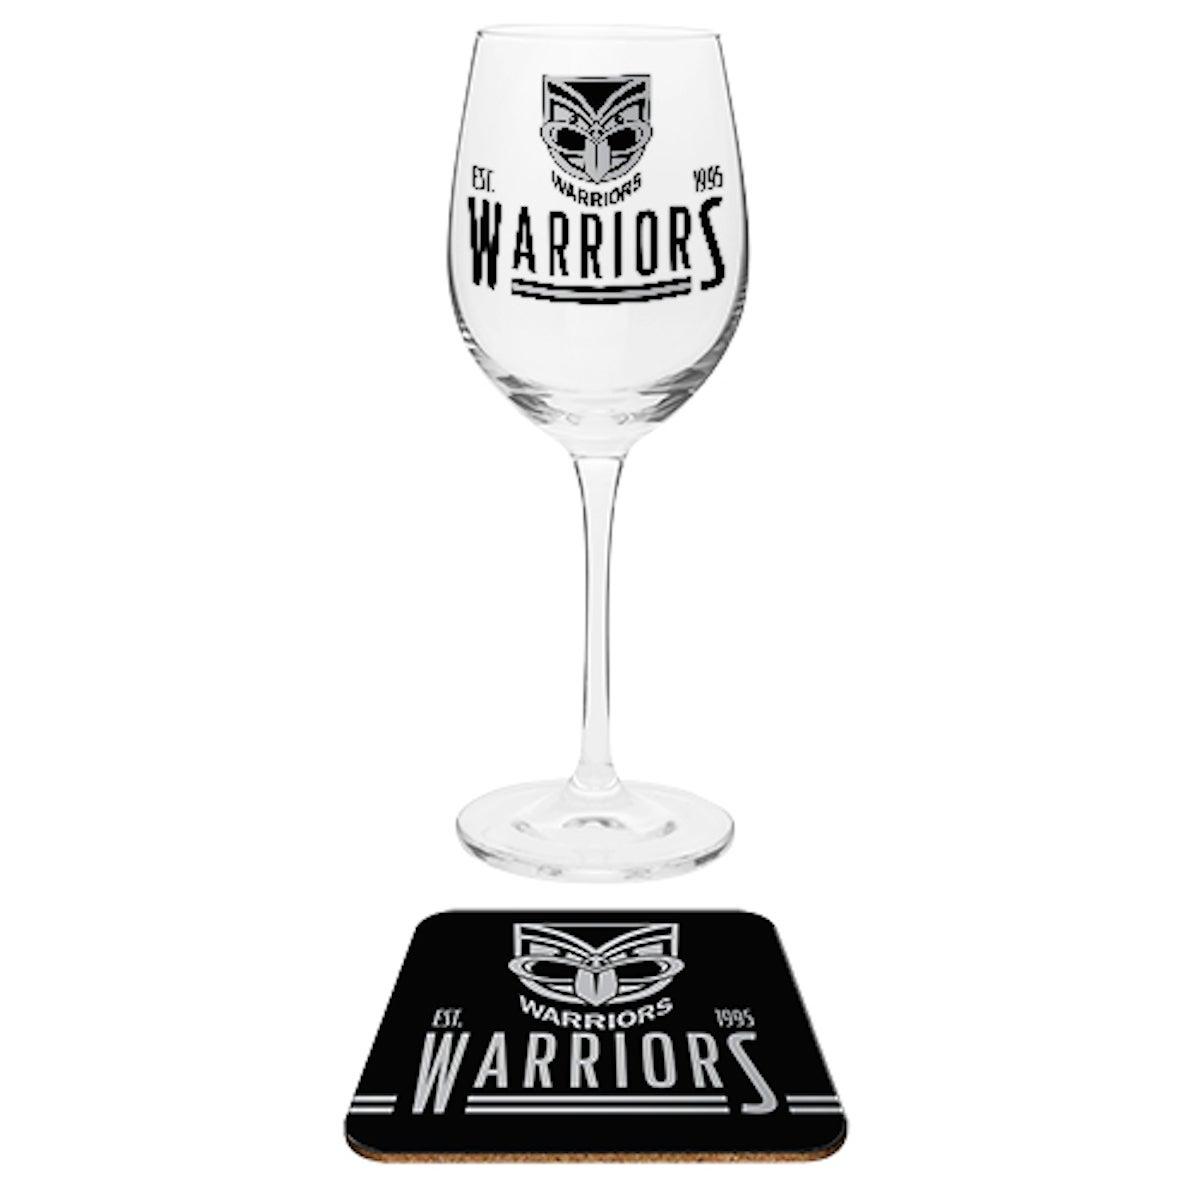 New Zealand Warriors NRL Wine Glass And Coaster Set